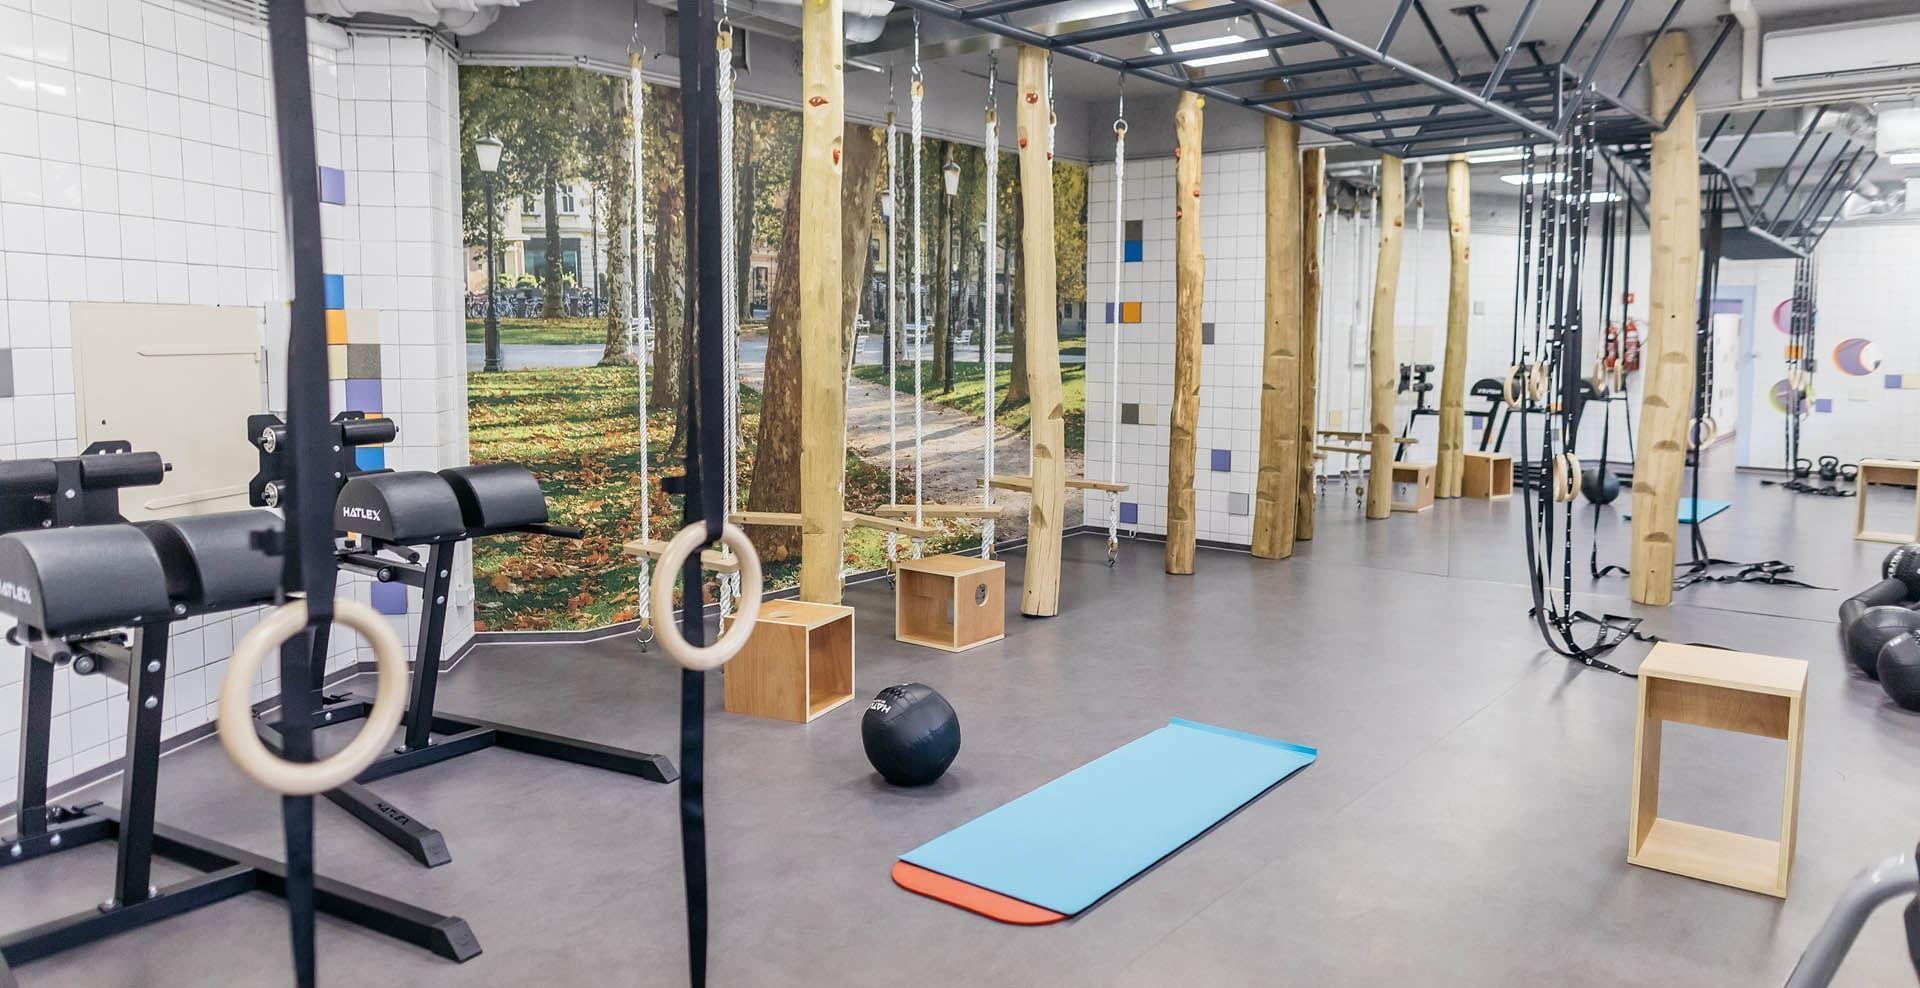 Gym at Grand Hotel Union in Ljubljana